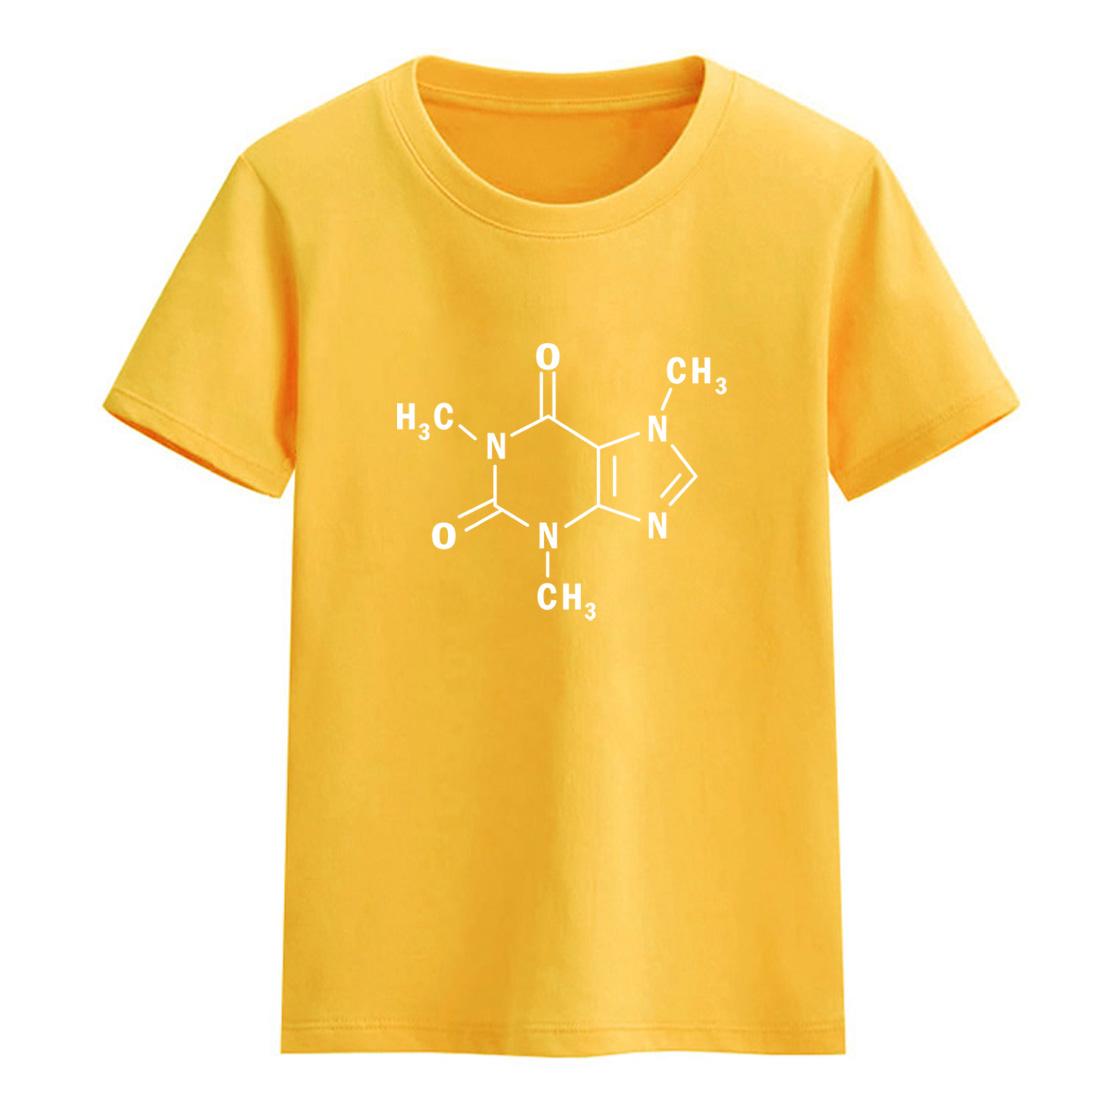 HTB1RWv6bD0ATuJjSZFEq6yp2FXaN - 2017 children T-shirt summer The Big Bang Theory famous T-shirts for girls Caffeine Molecular Formula Sheldon boys t shirt top